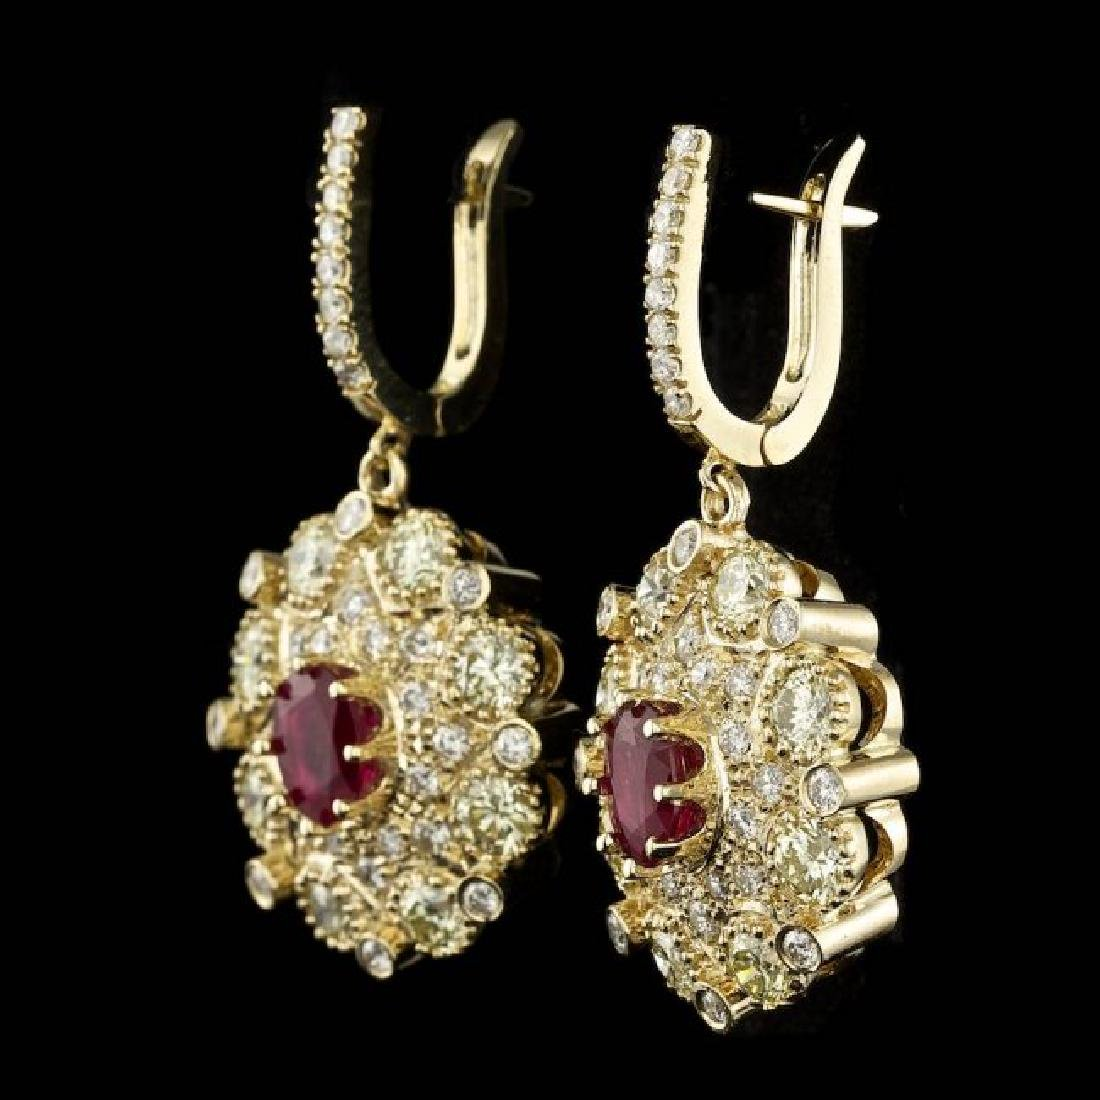 14k Yellow Gold 2.50ct Ruby 7ct Diamond Earrings - 2